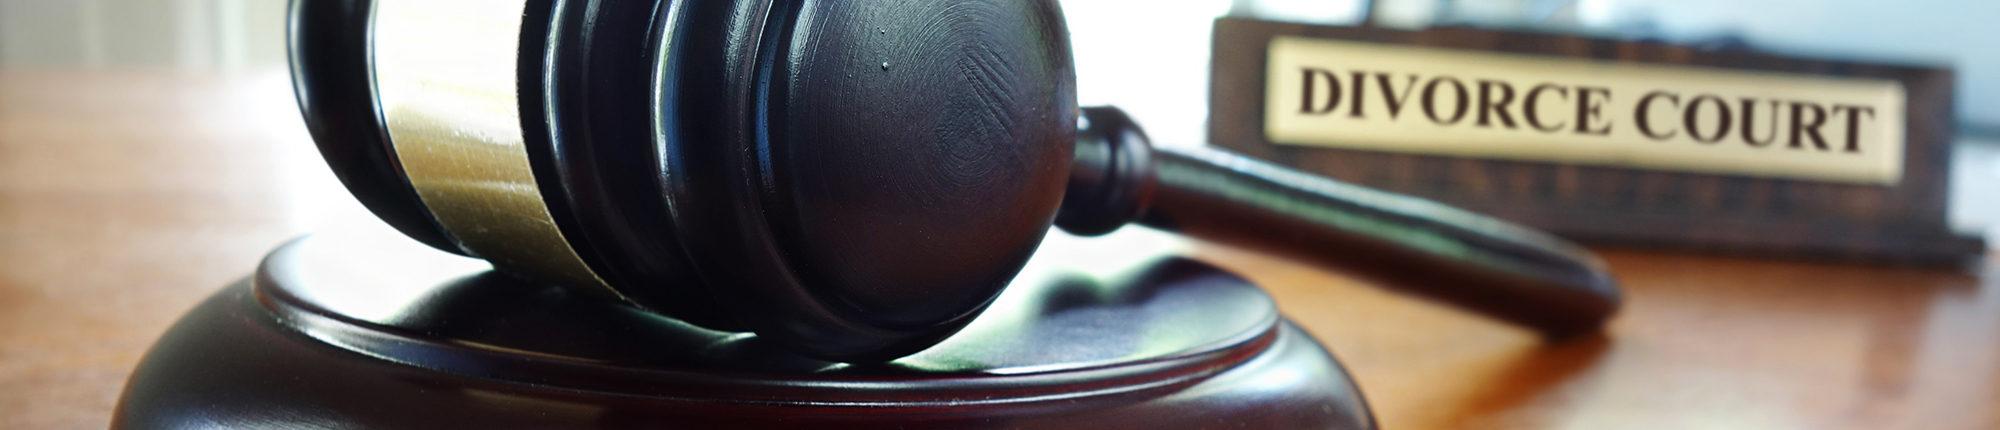 divorce court close up shot